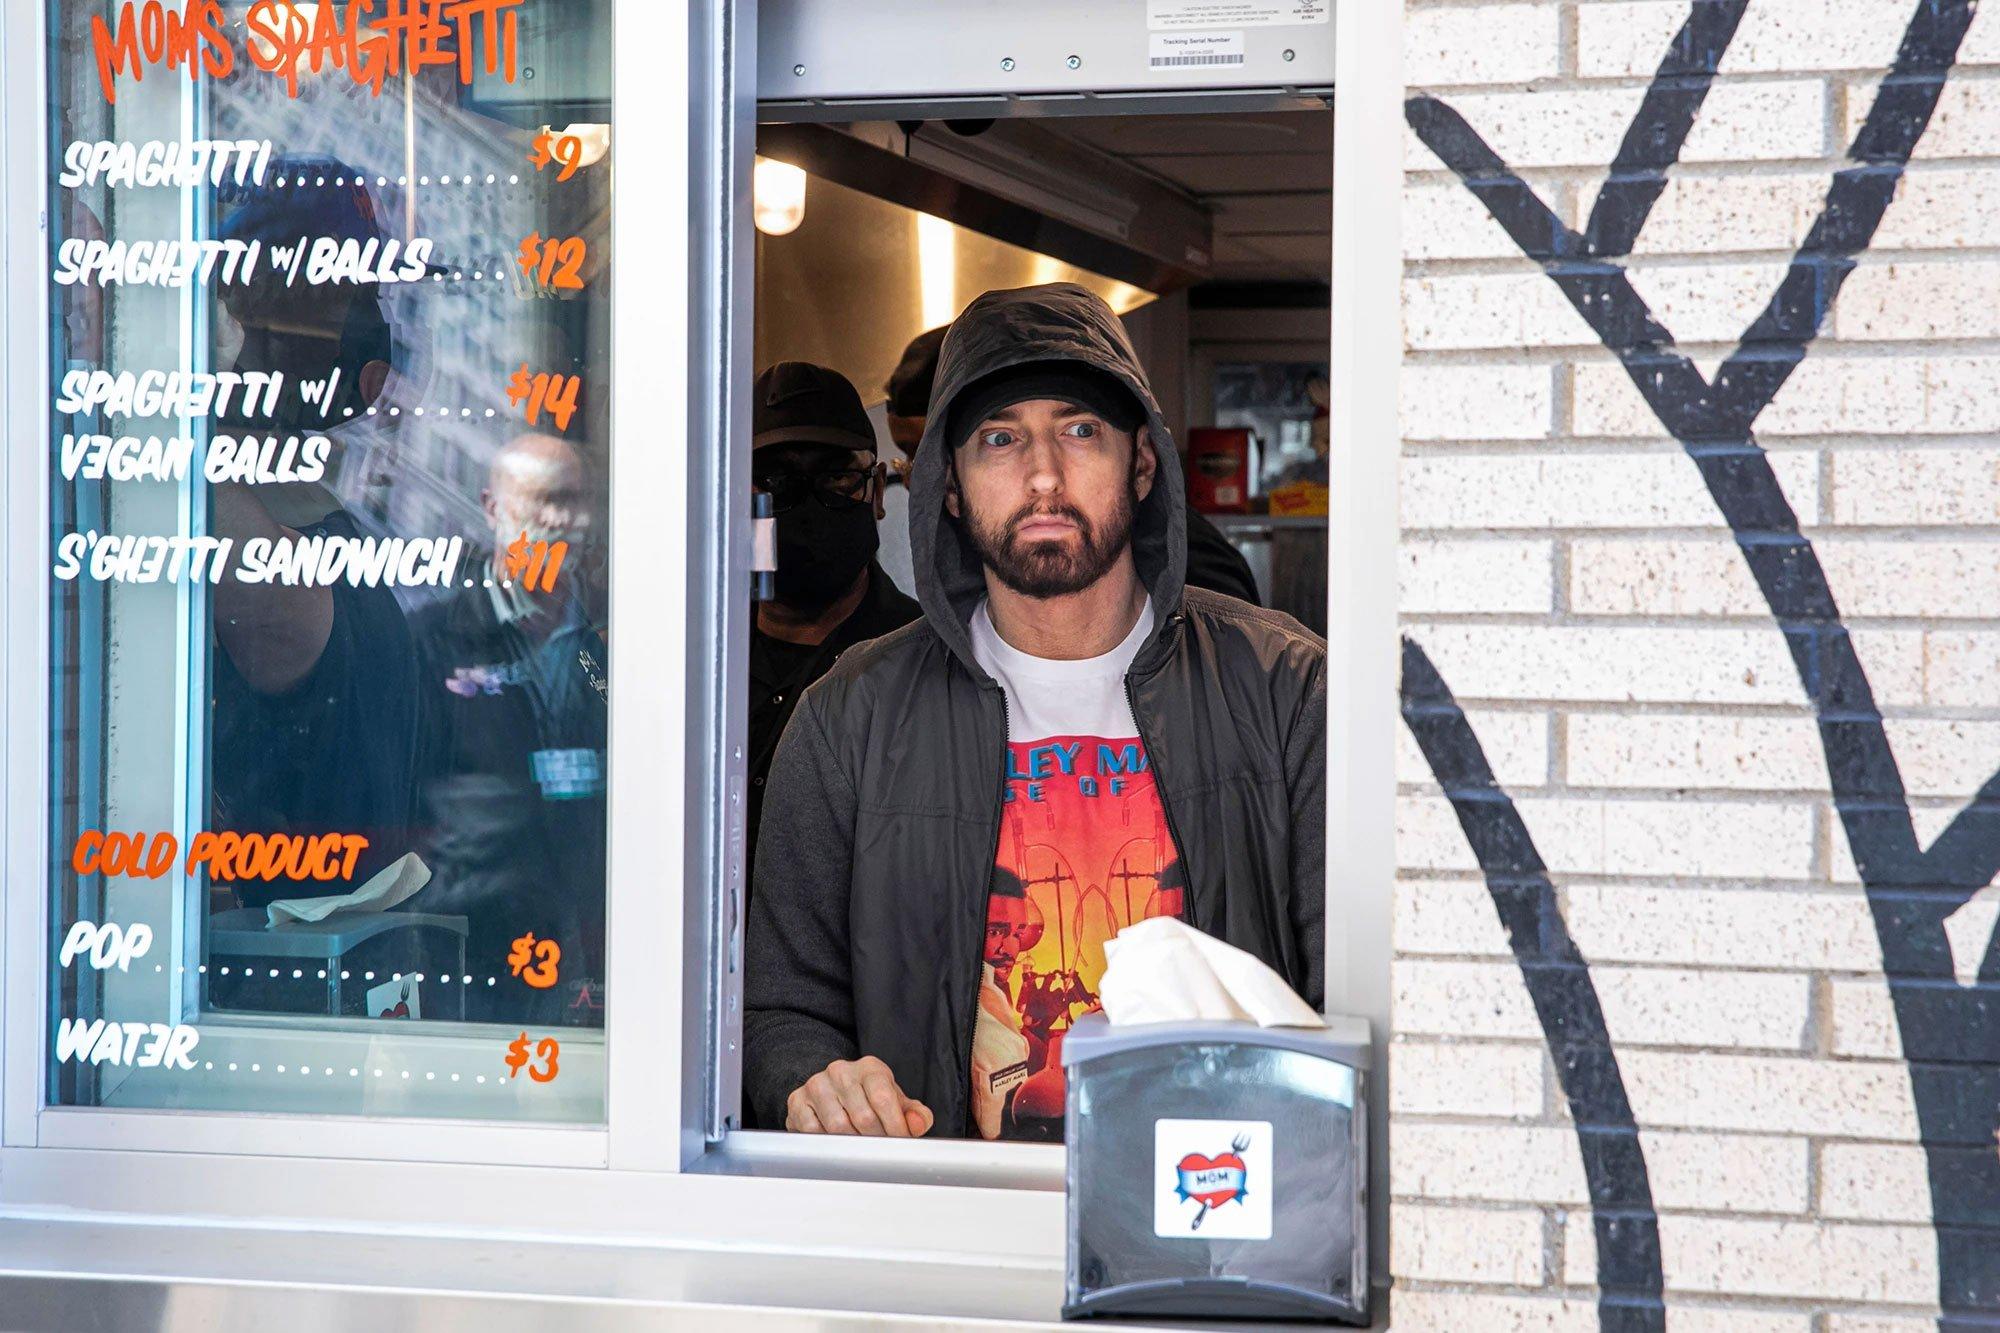 Eminem shocks fans at the grand opening of Mom's Spaghetti restaurant